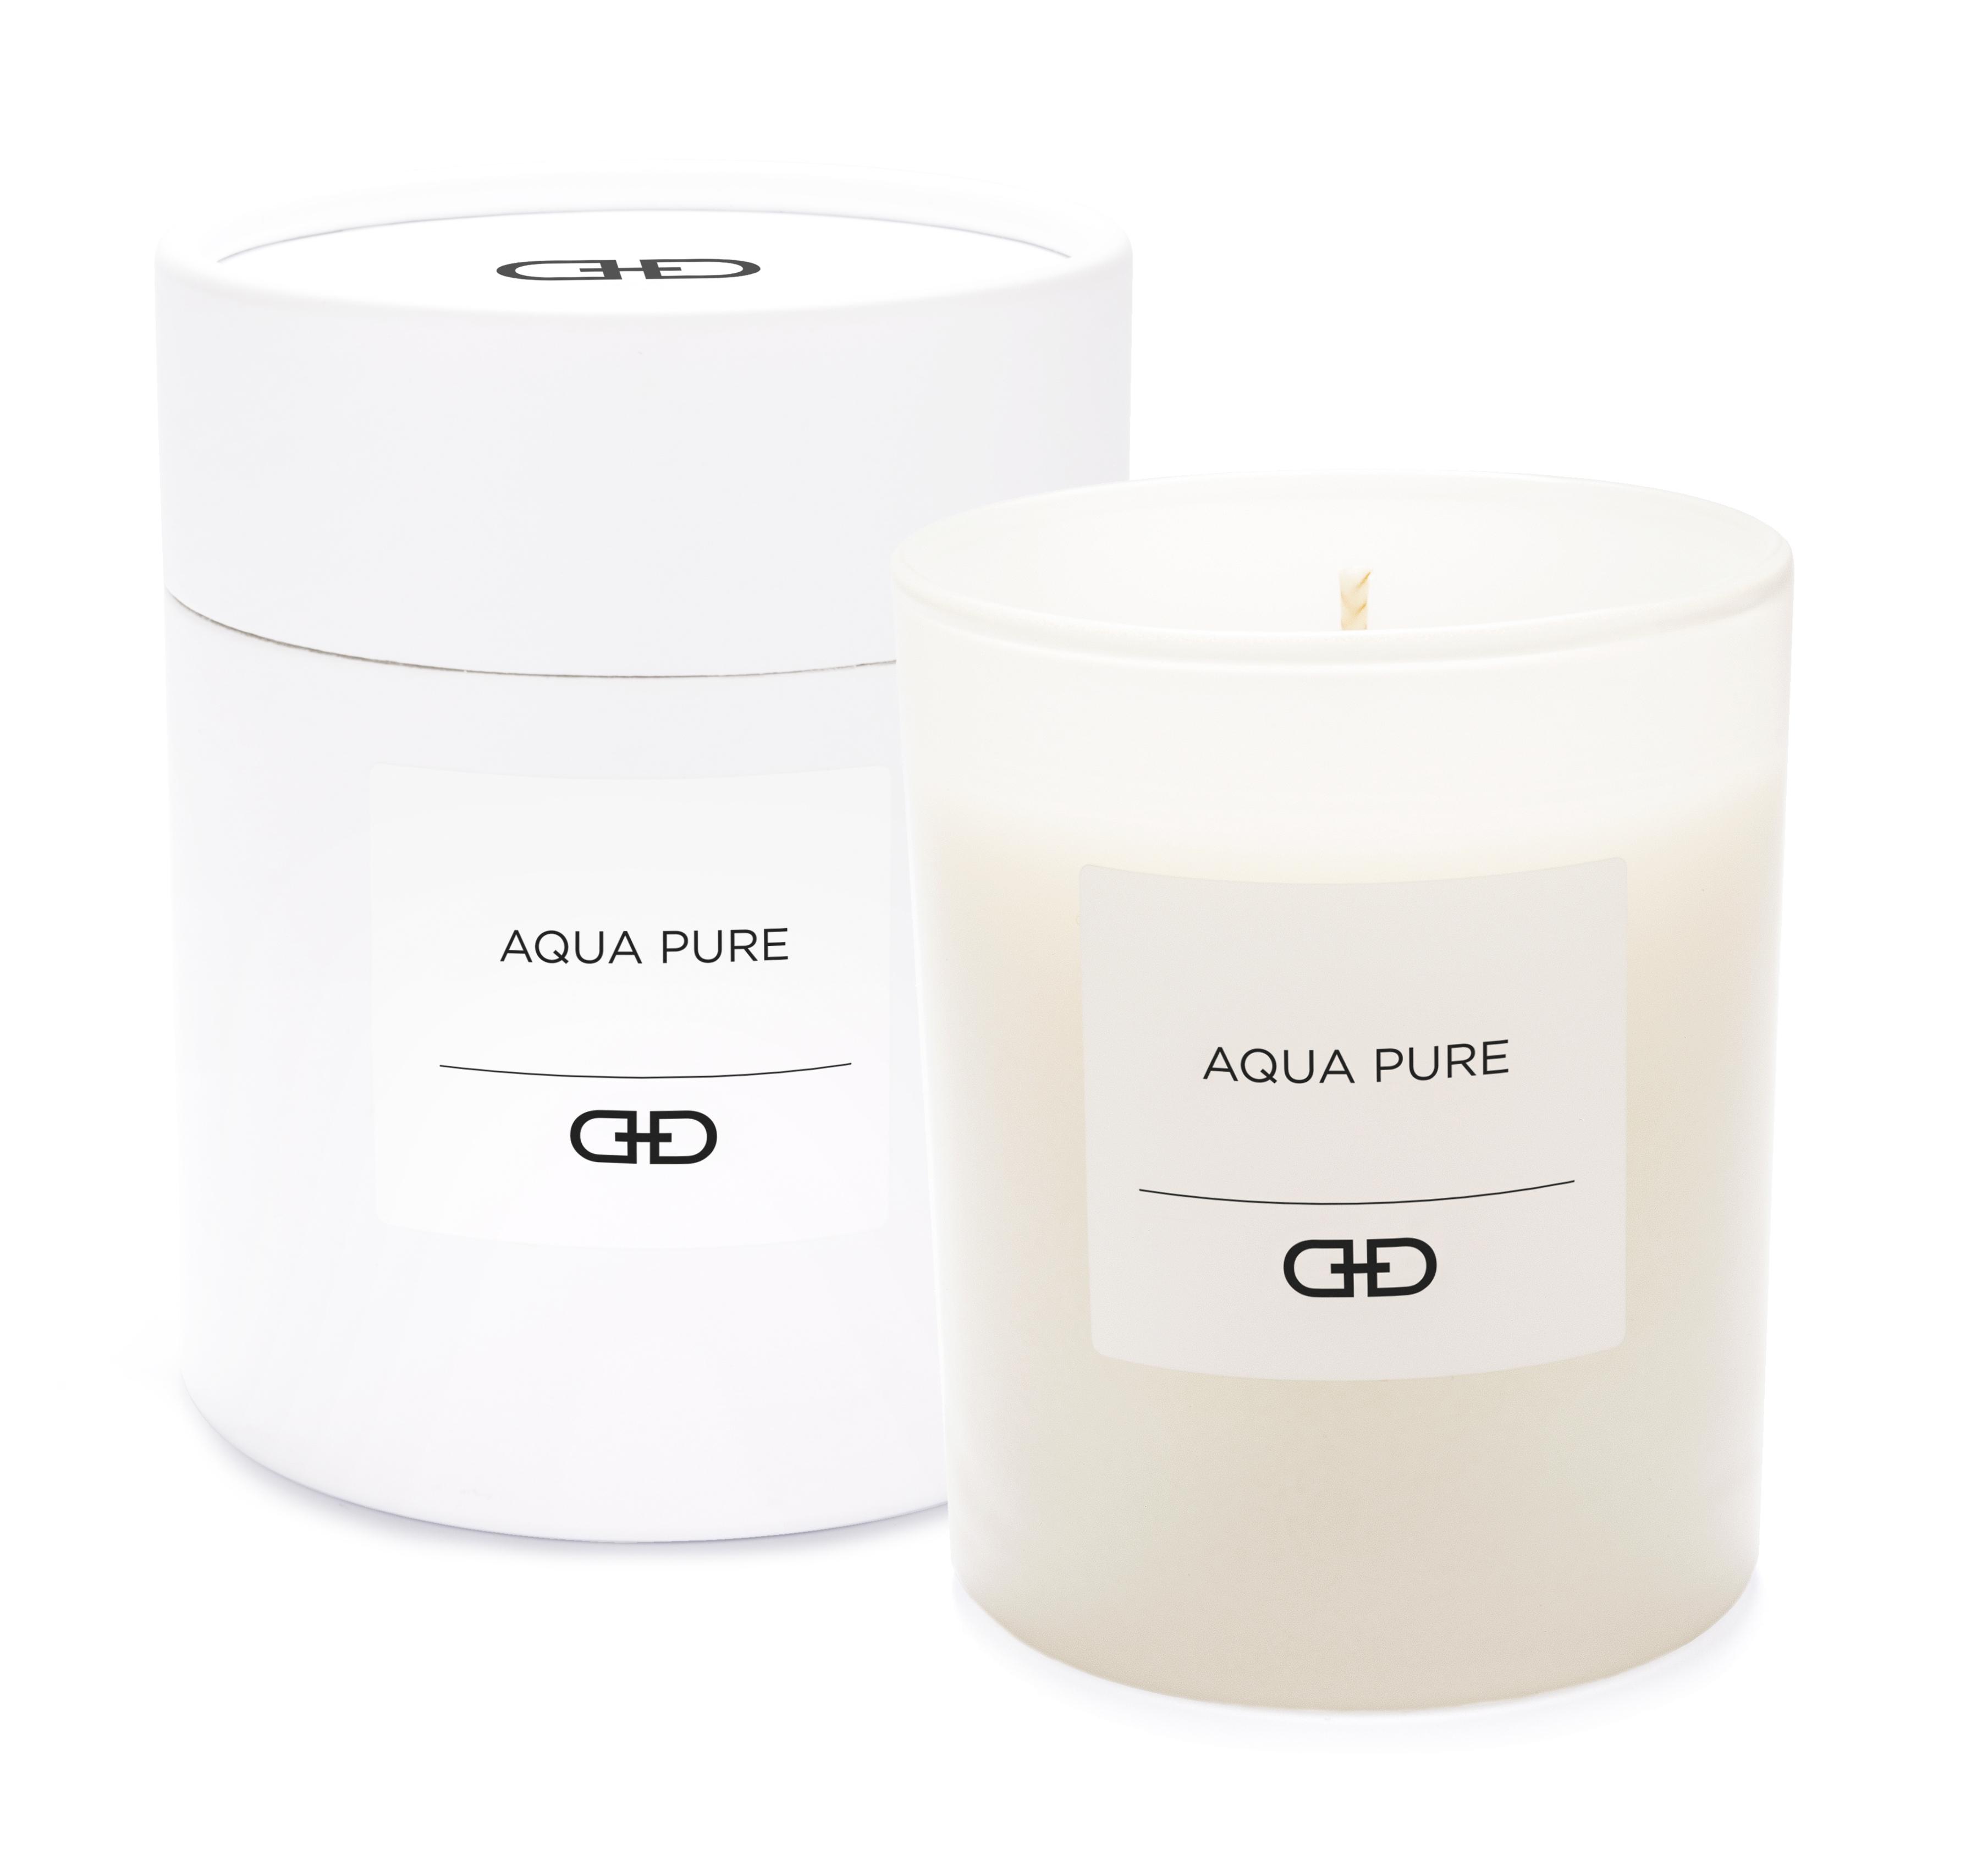 Aqua Pure - Black & White natural candle